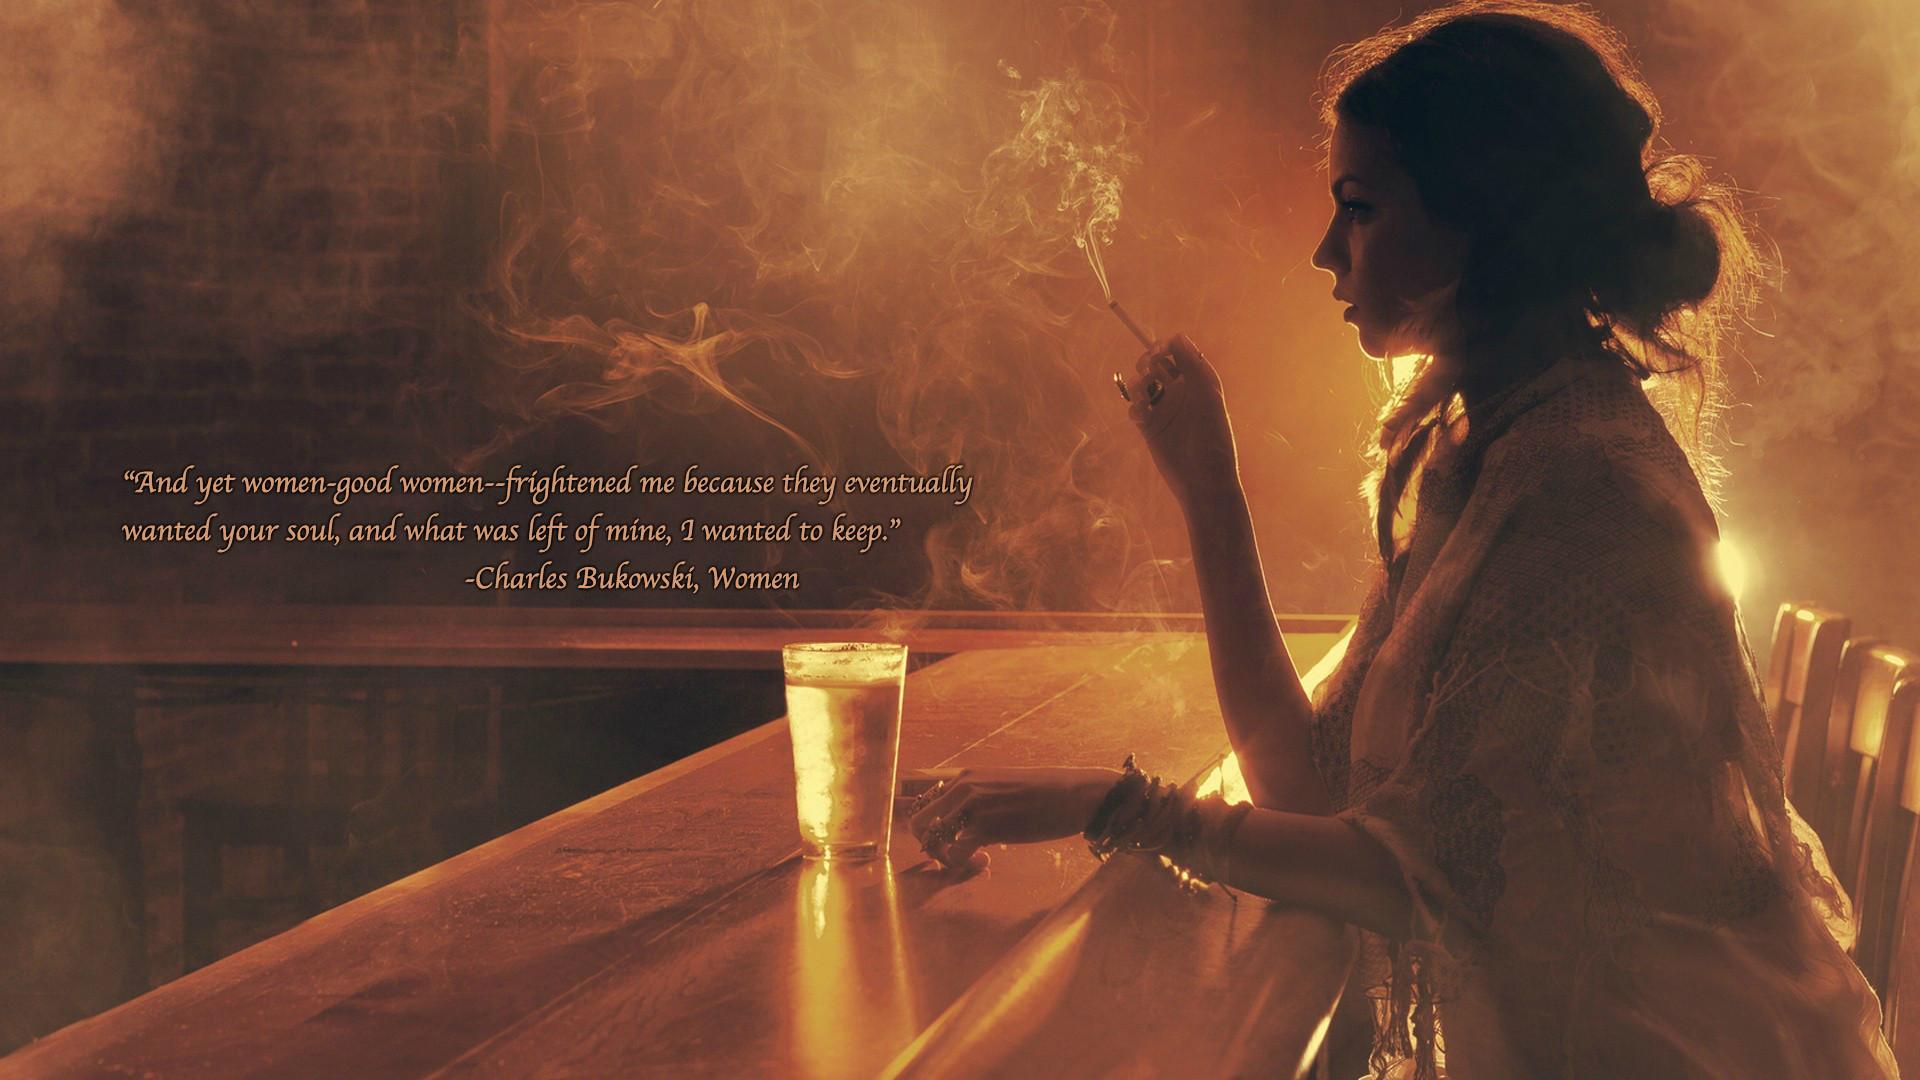 bdfeedbd-drink-bar-girl-wallpaper-wp3401444